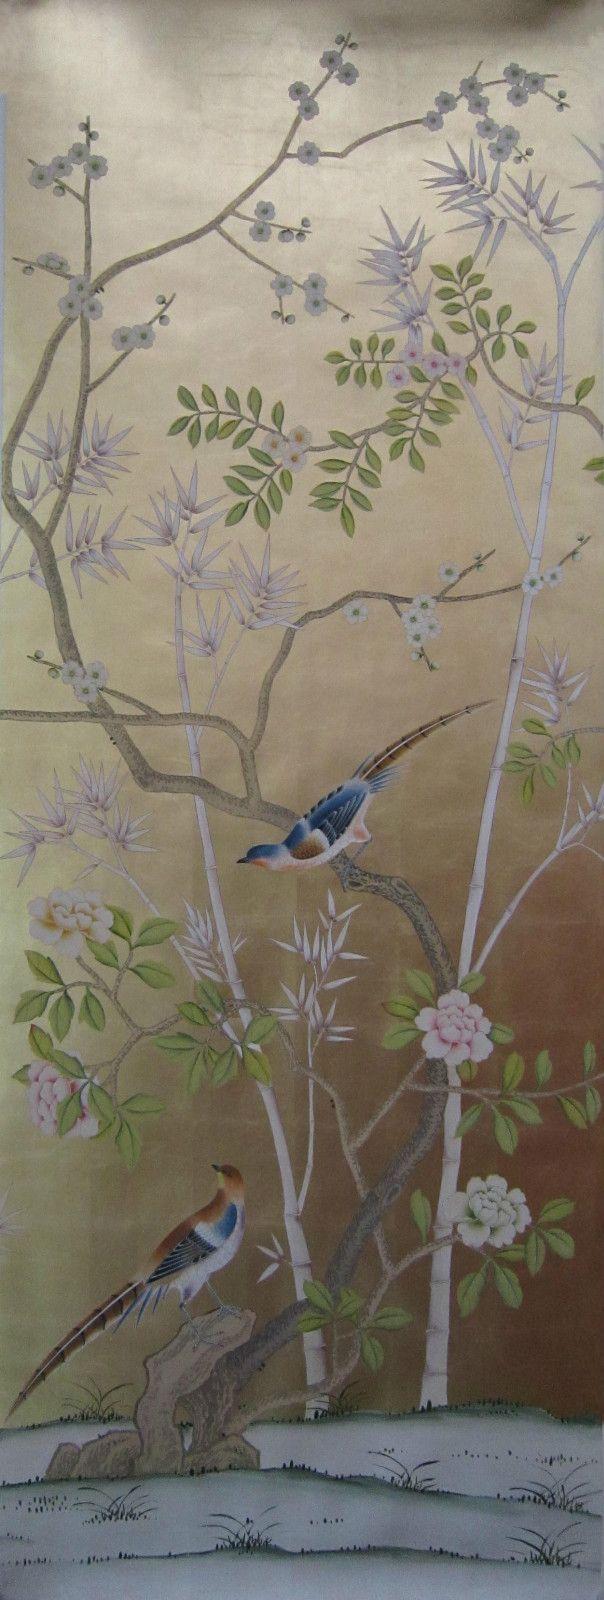 Chinoiserie Handpainted Silk Wallpaper Birds Awakening Garden On Metallic Leaf Ebay With Images Hand Painted Wallpaper